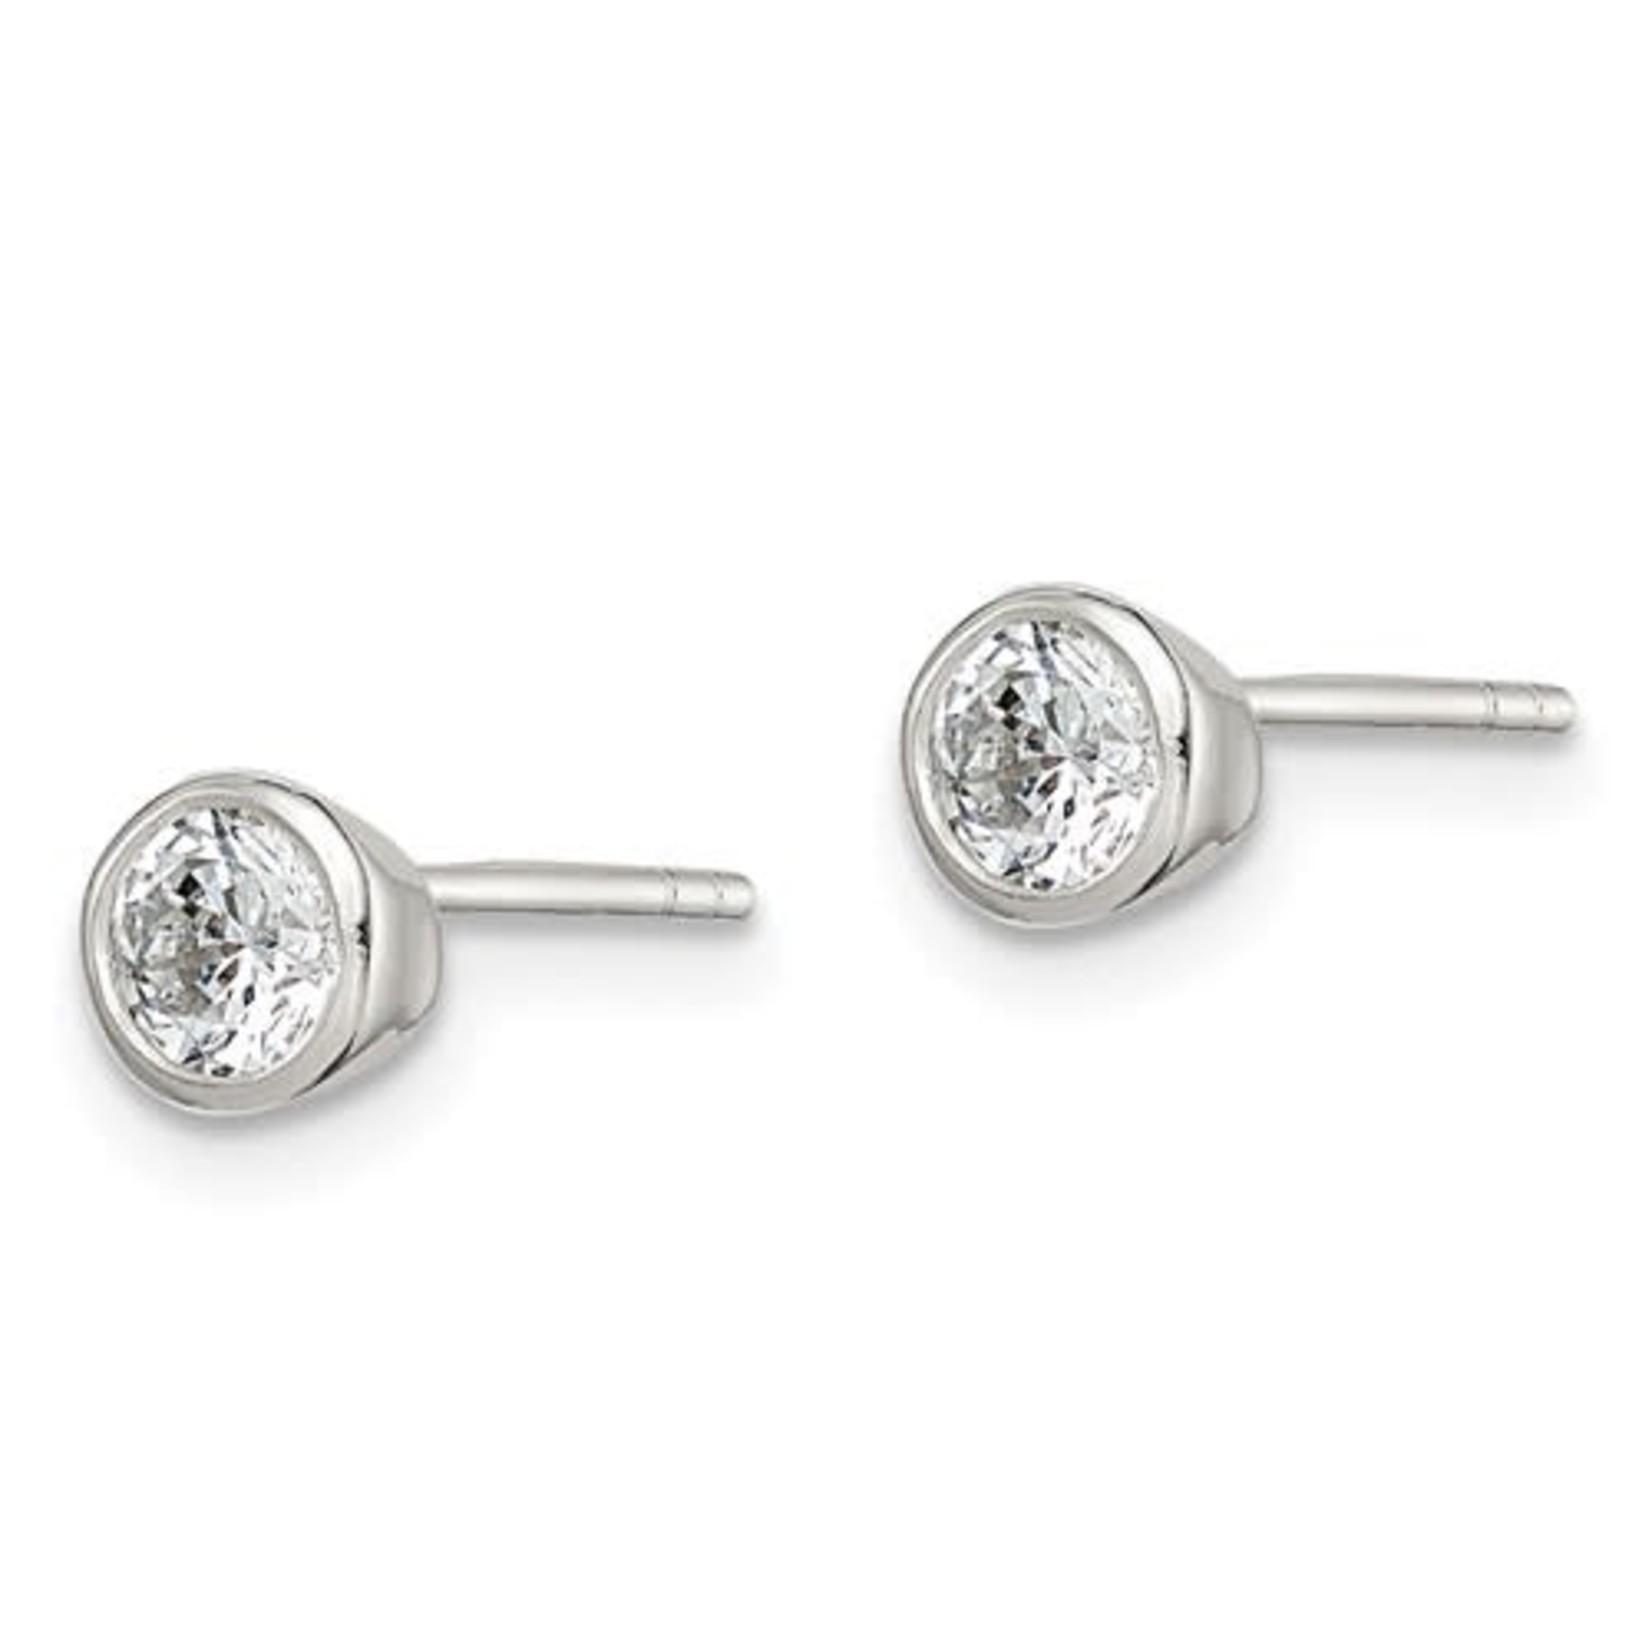 This Is Life CZ Bezel Set Earrings - 4 mm